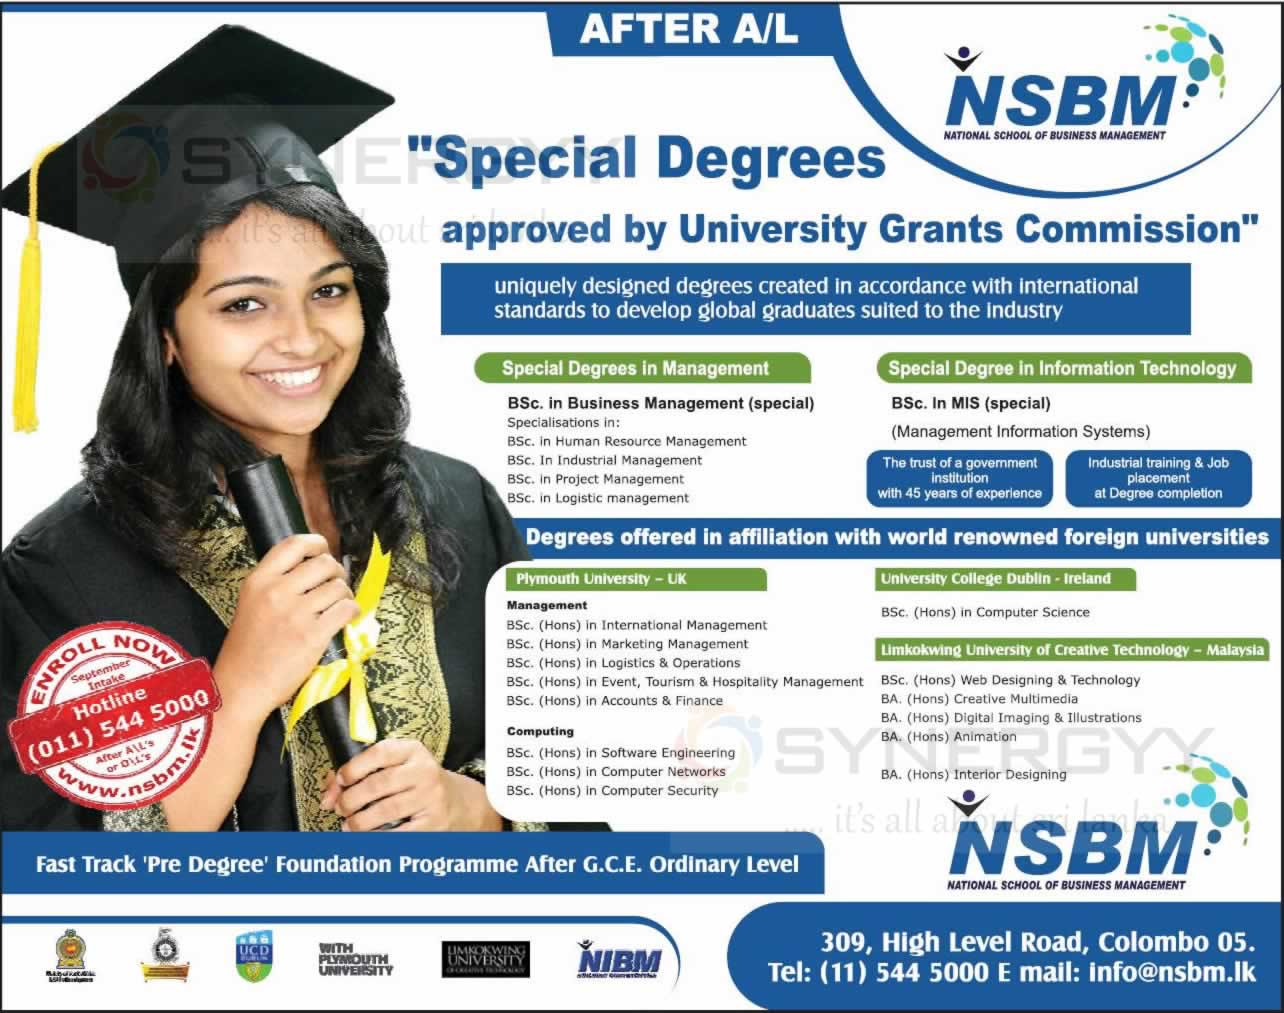 Nsbm Degree Programmes Synergyy